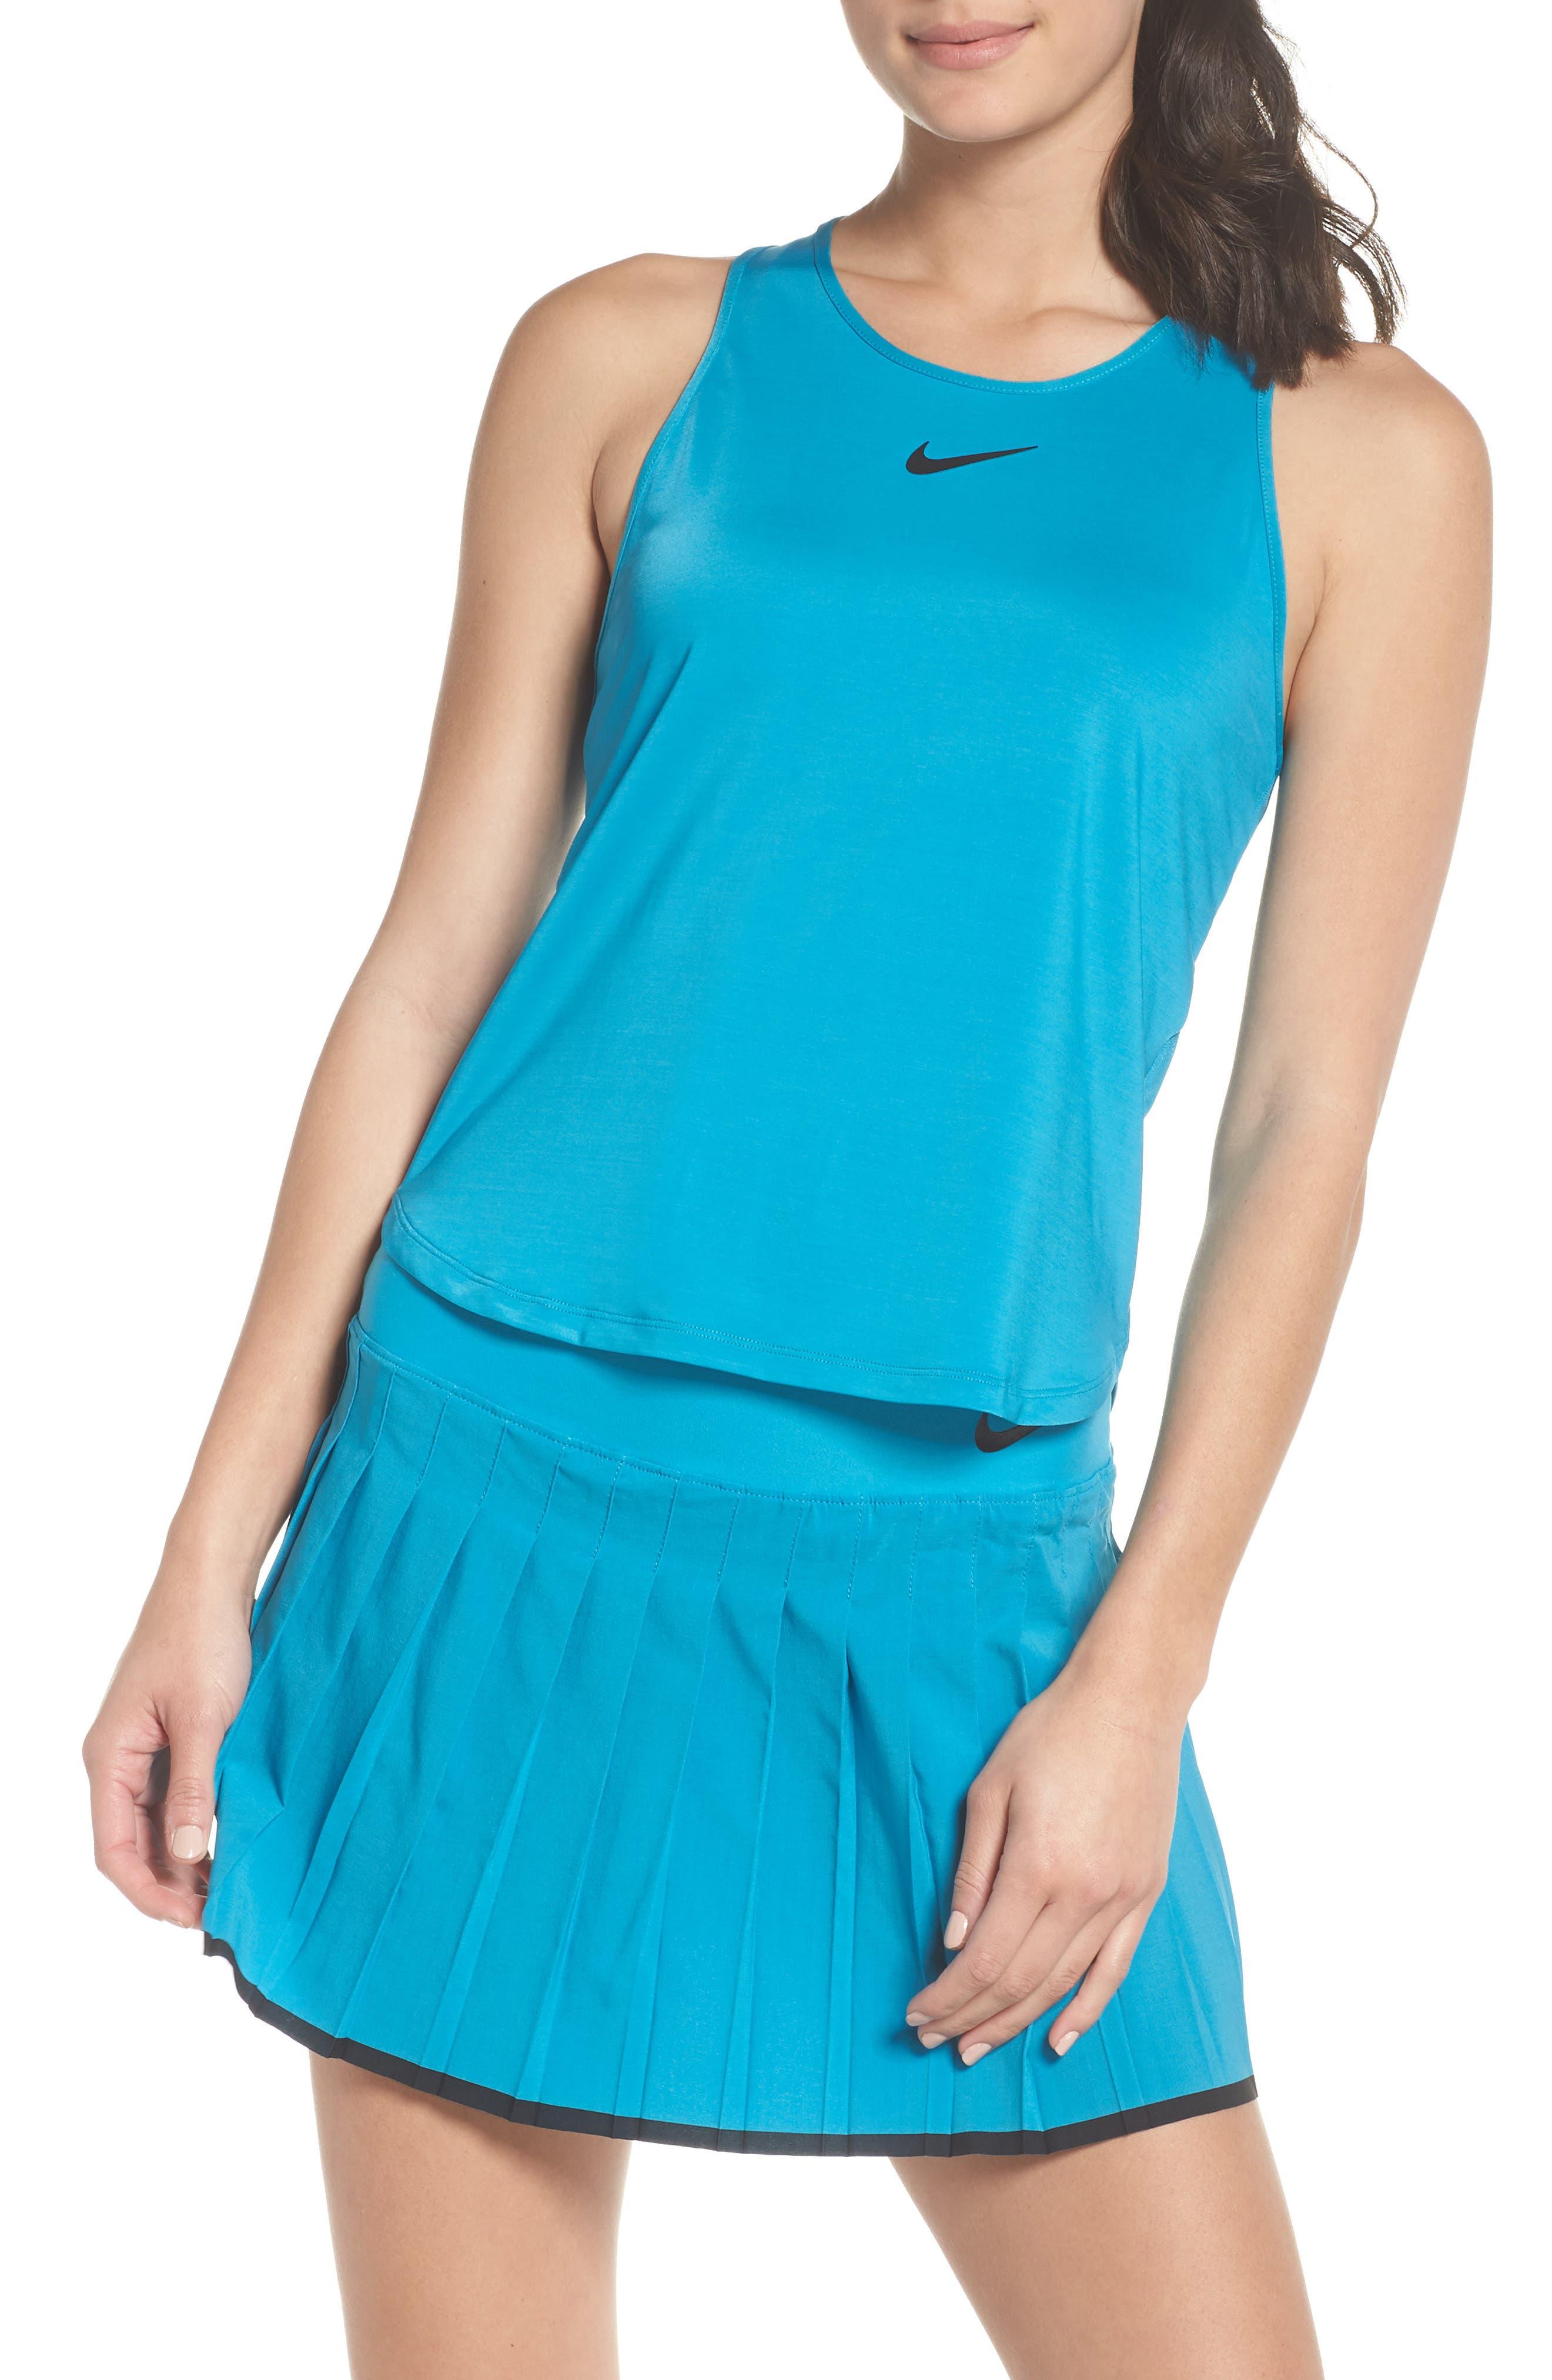 Court Dry Slam Tennis Tank,                             Main thumbnail 1, color,                             Neo Turquoise/ Black